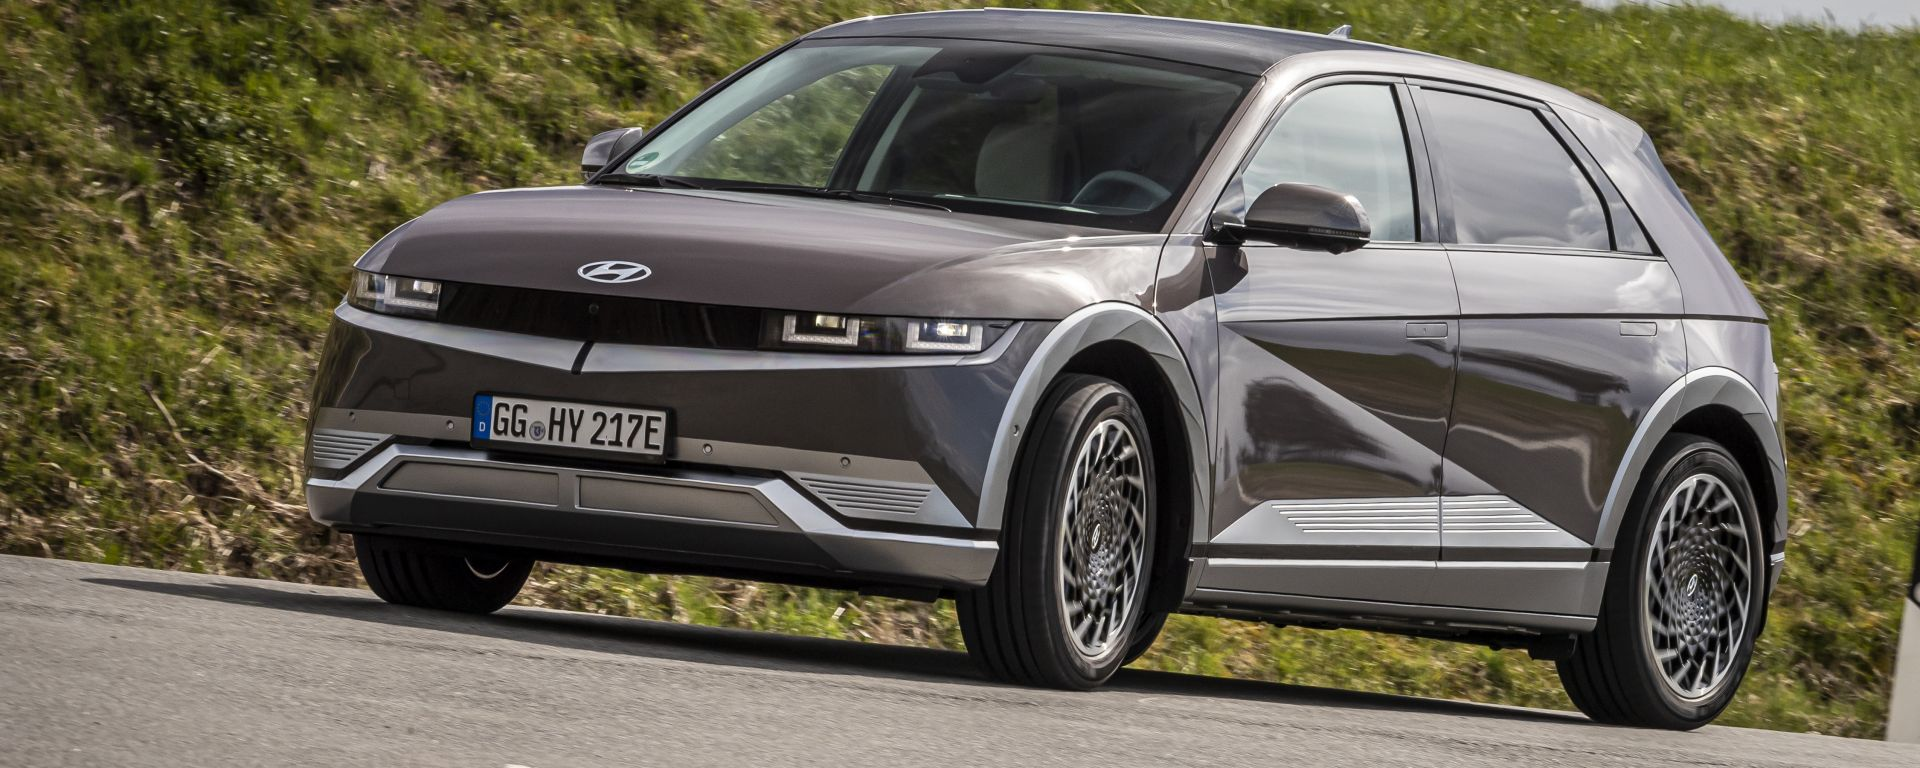 Hyundai Ioniq 5: video anteprima